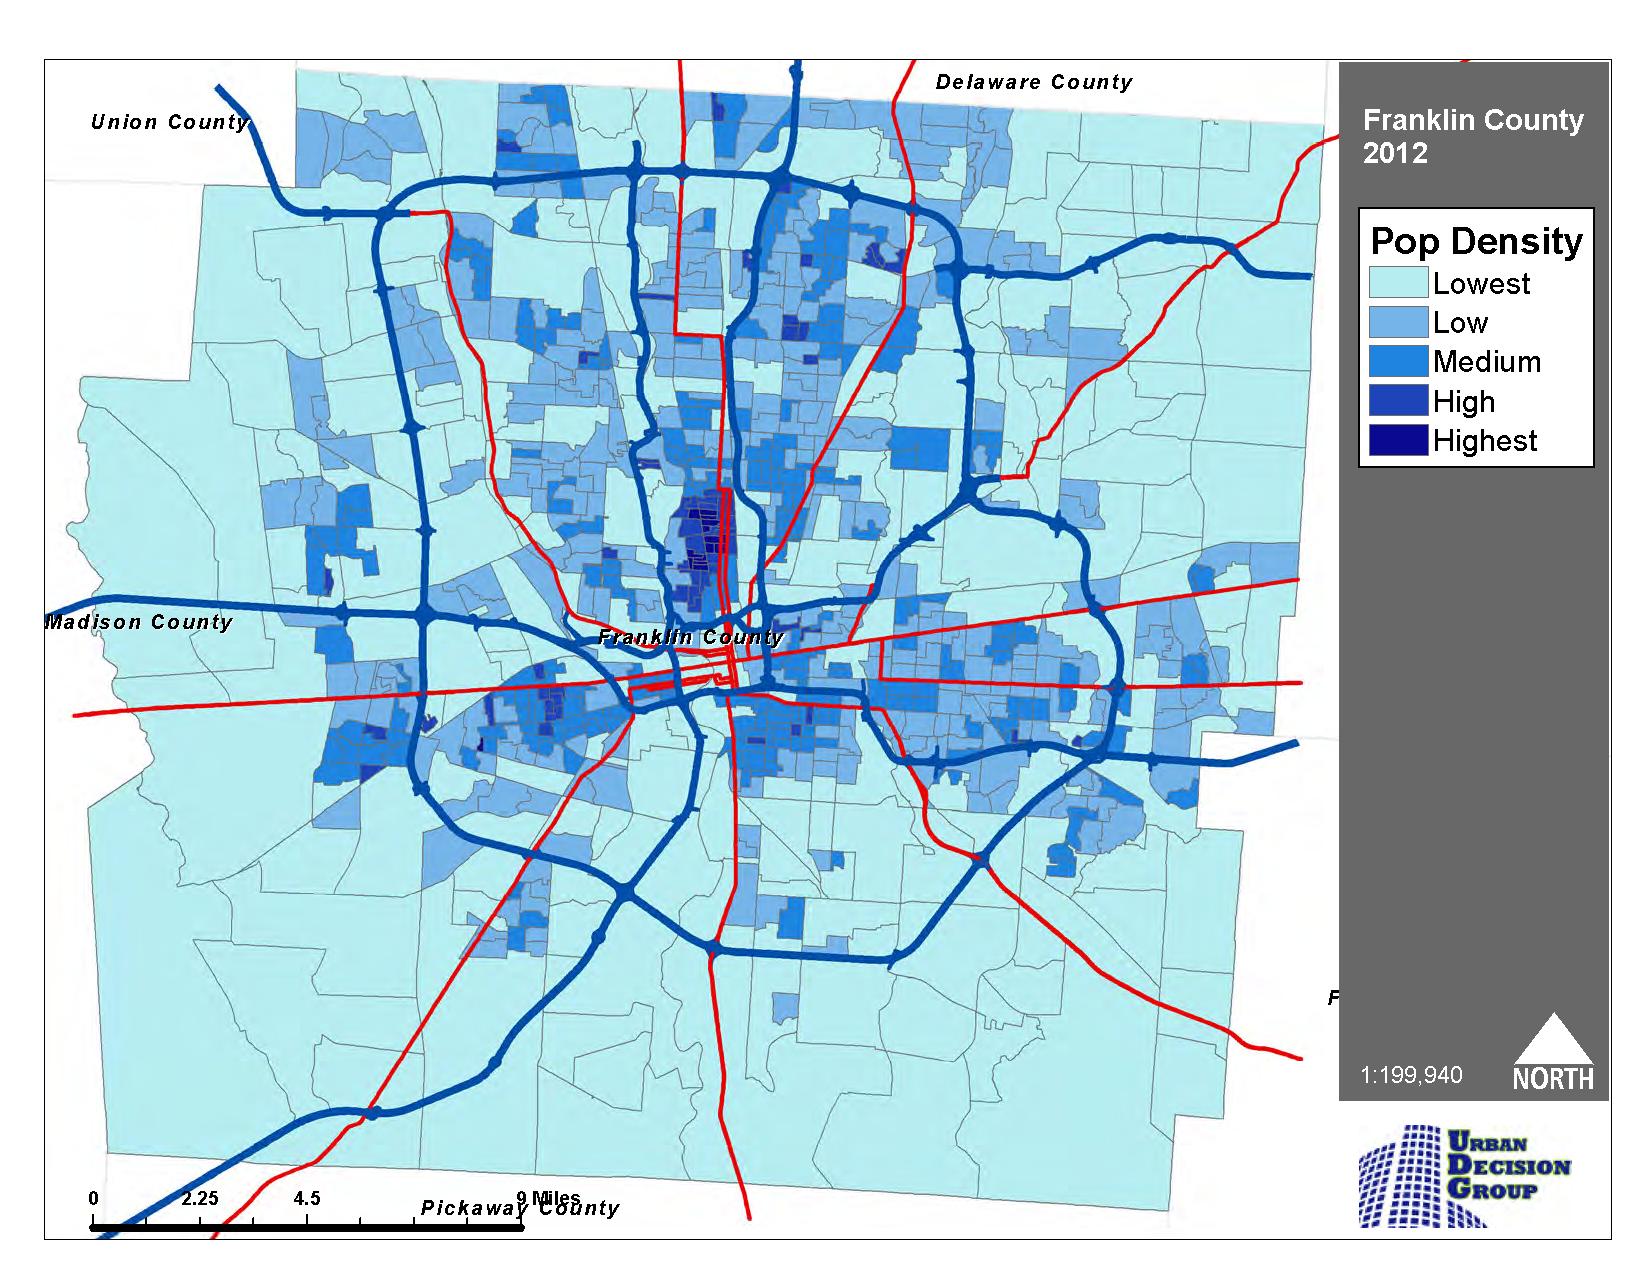 2012 Pop Density